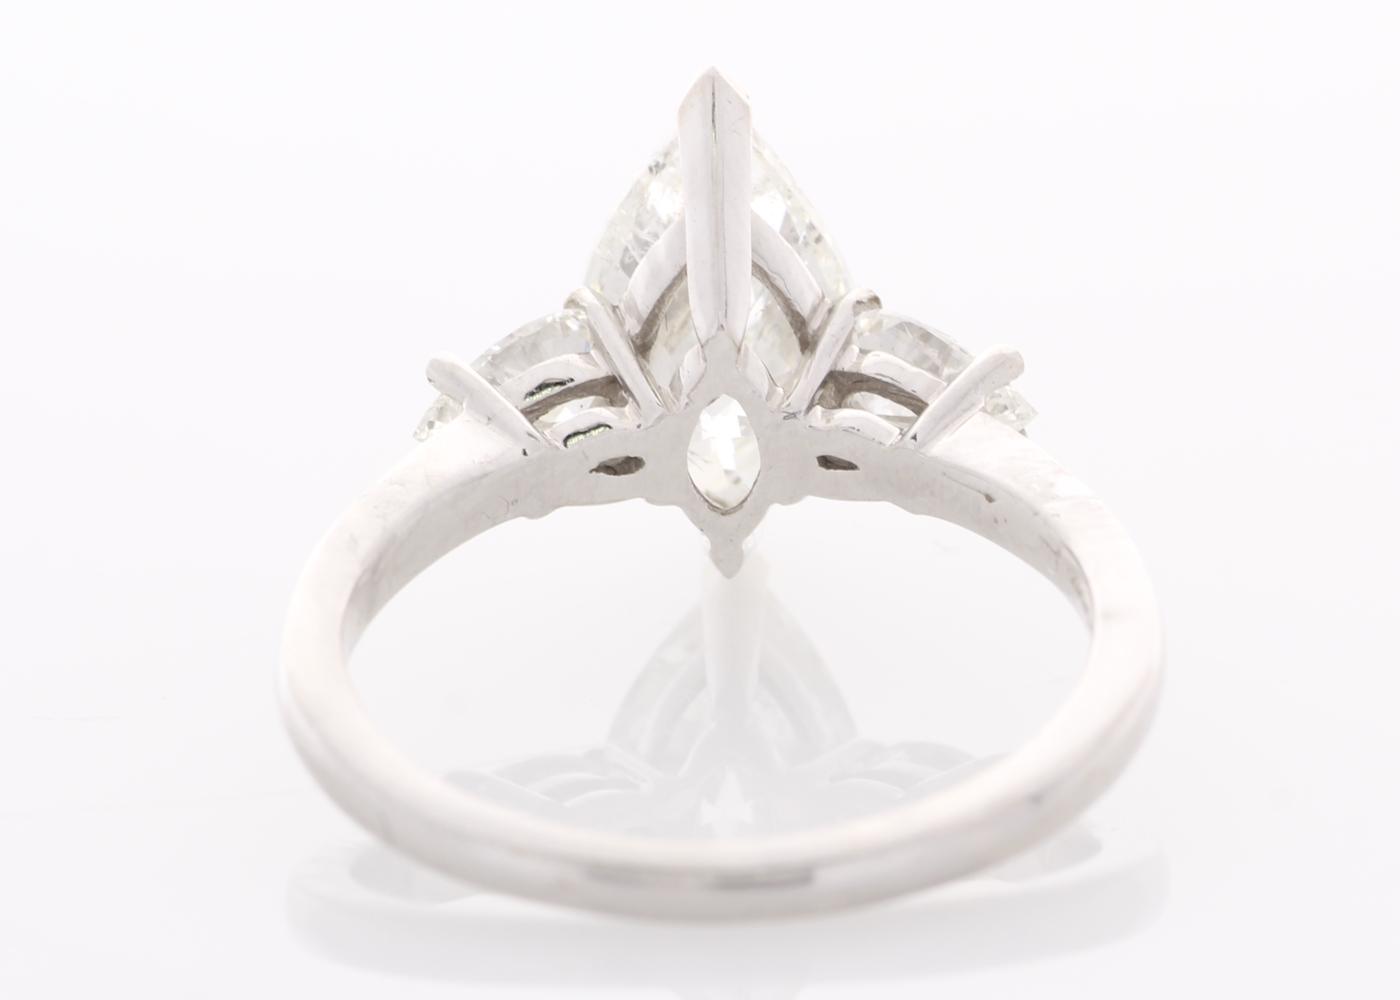 Lot 55 - 18ct White Gold Three Stone Claw Set Diamond Ring 2.51